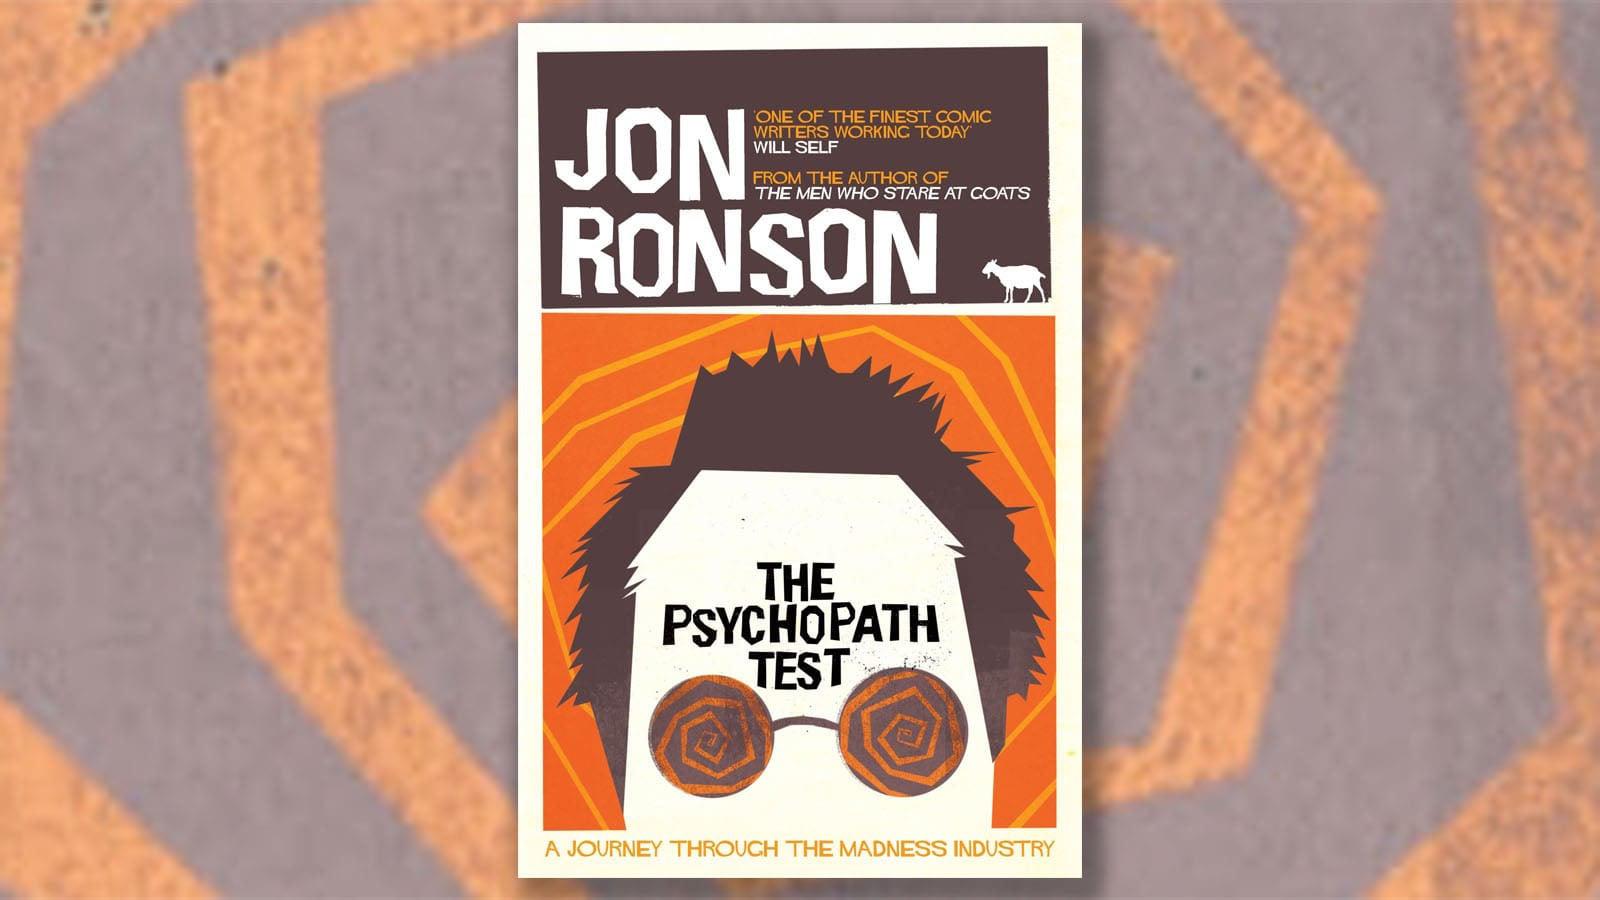 Jon Ronson The Psychopath Test Book Cover